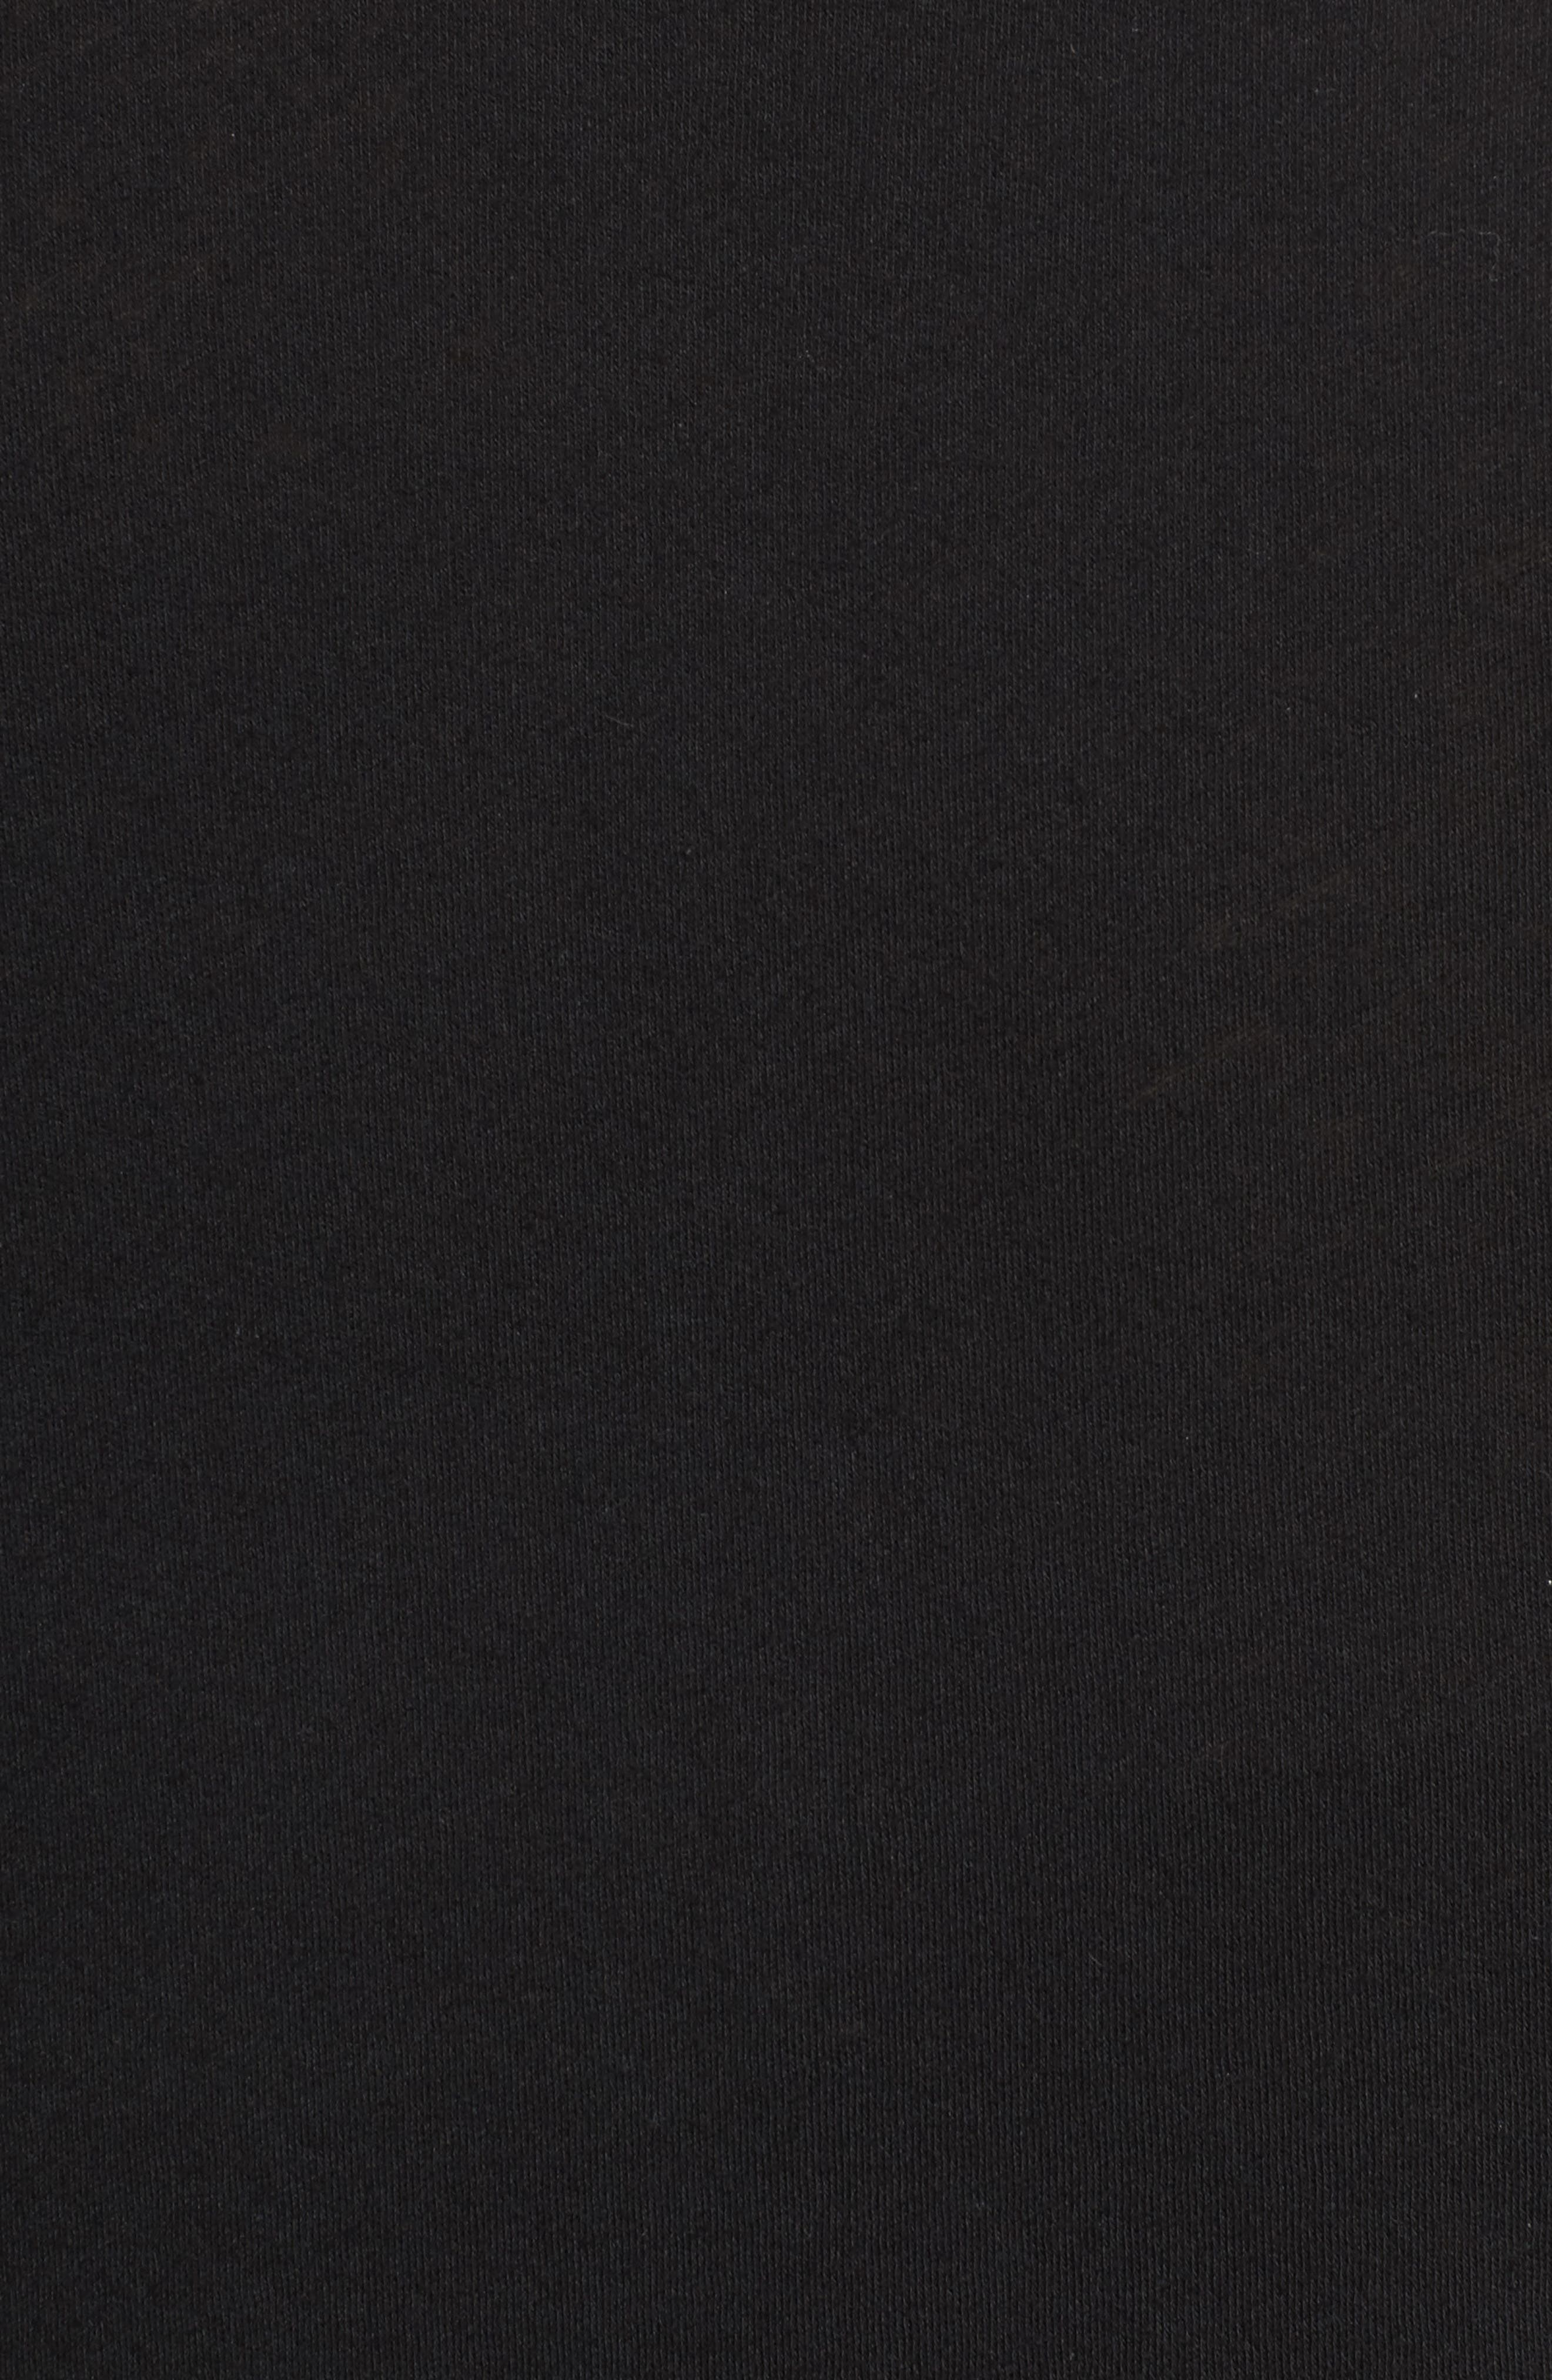 X-Ray Vision Bodysuit,                             Alternate thumbnail 5, color,                             Black